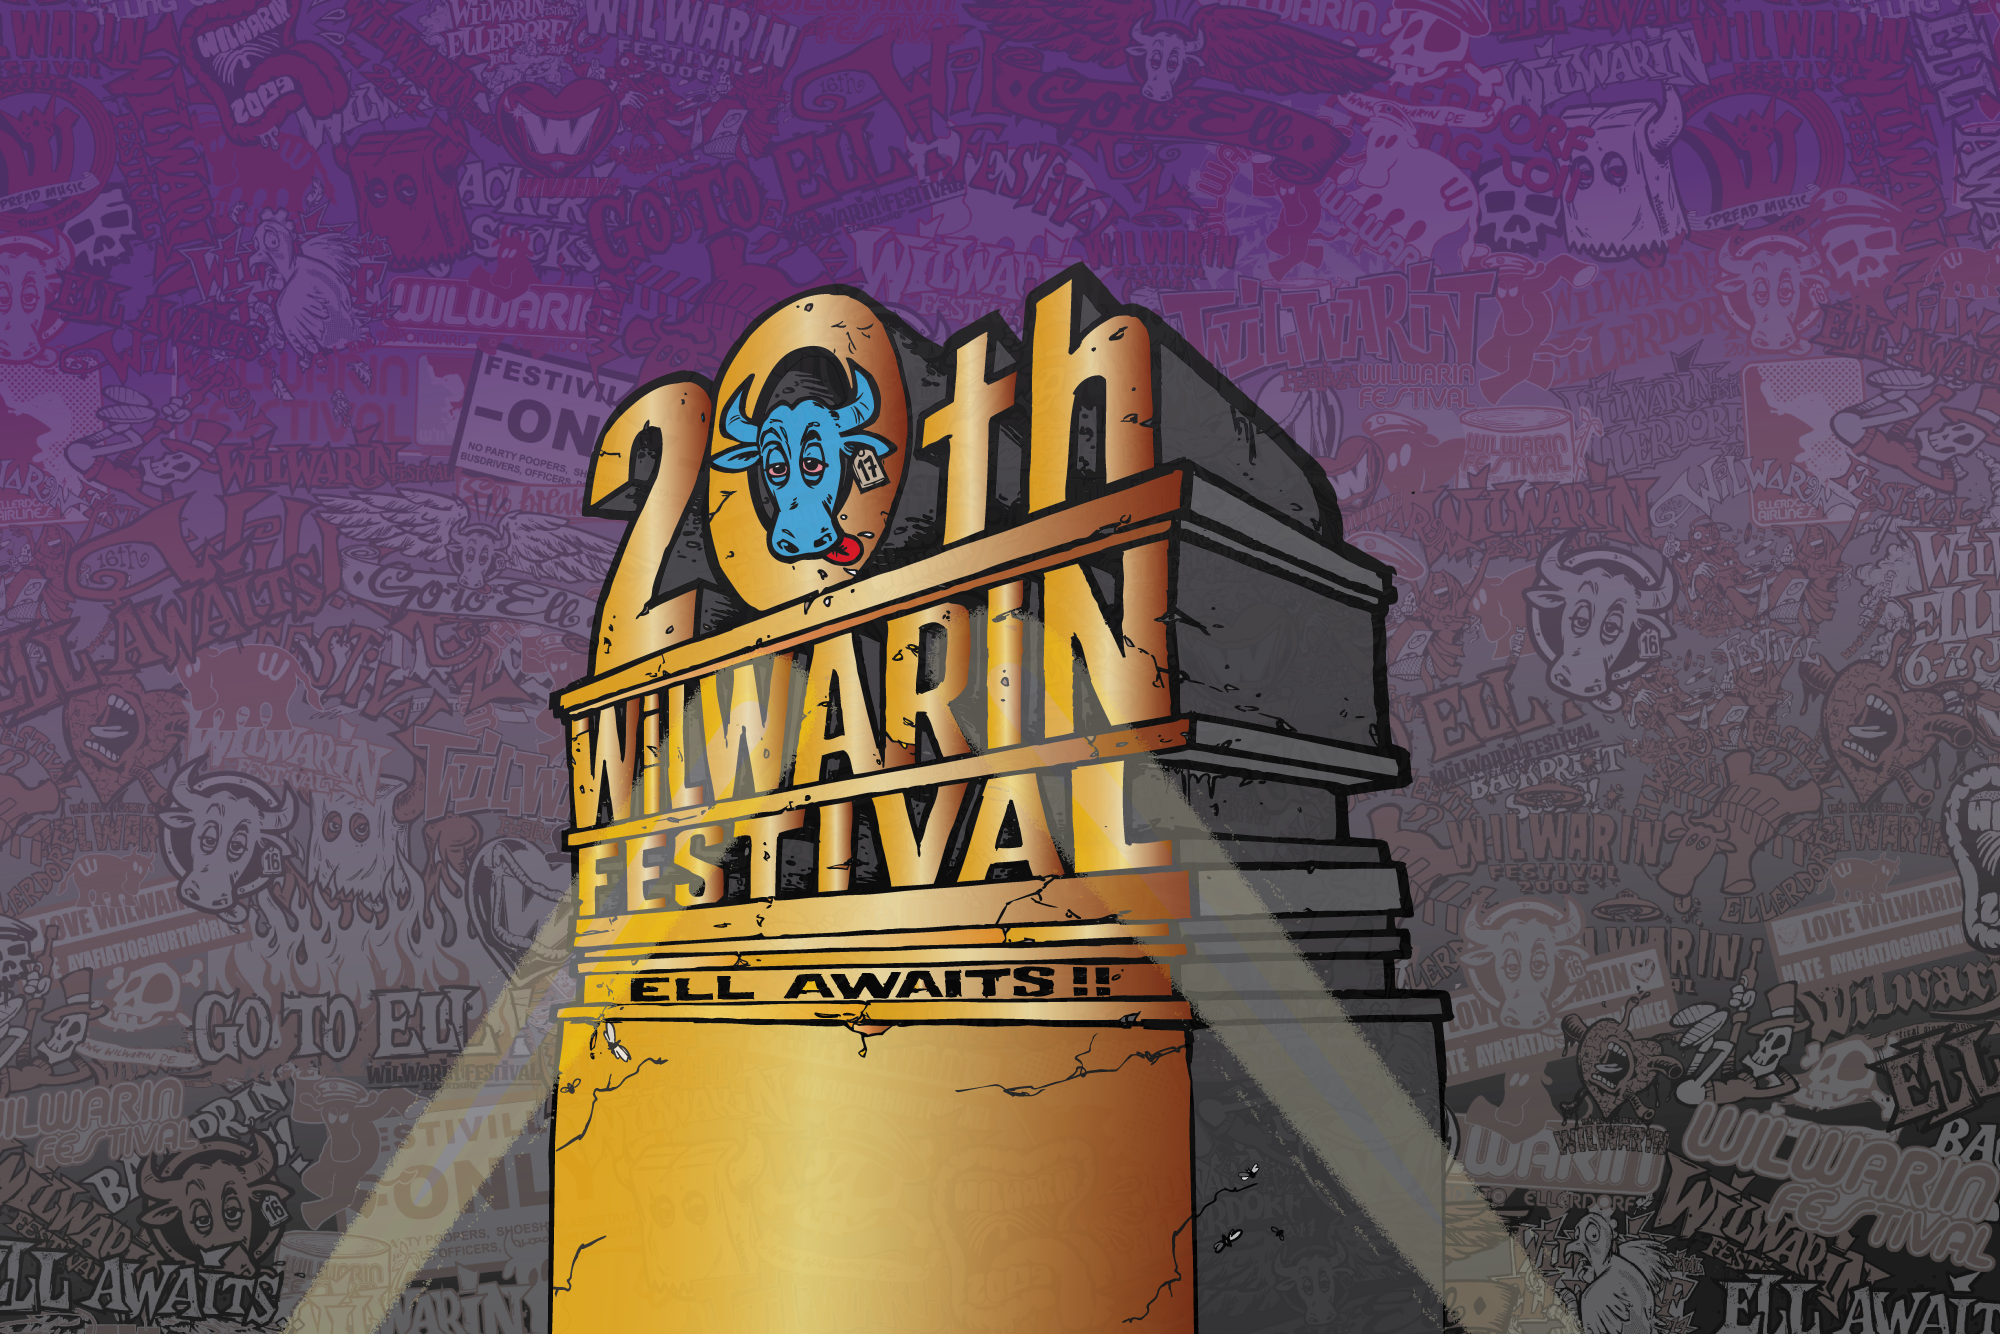 Wilwarin Festival 2017